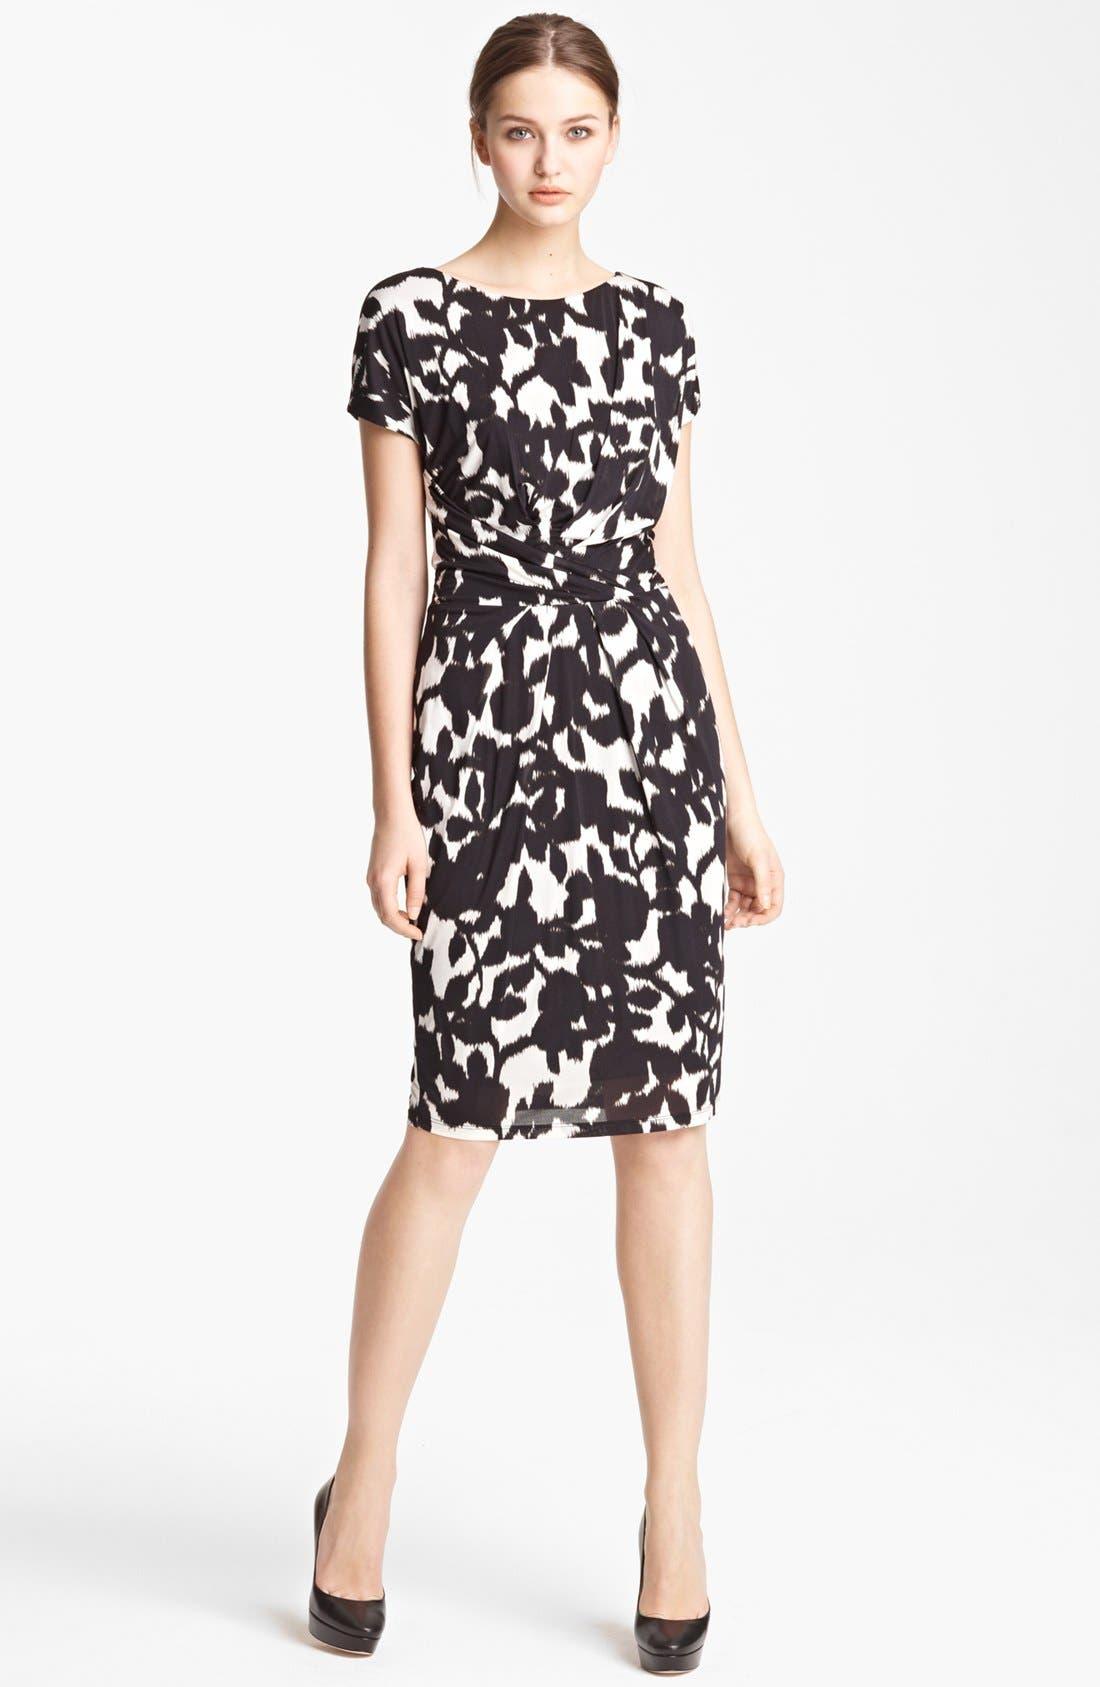 Alternate Image 1 Selected - Max Mara 'Canore' Print Jersey Dress